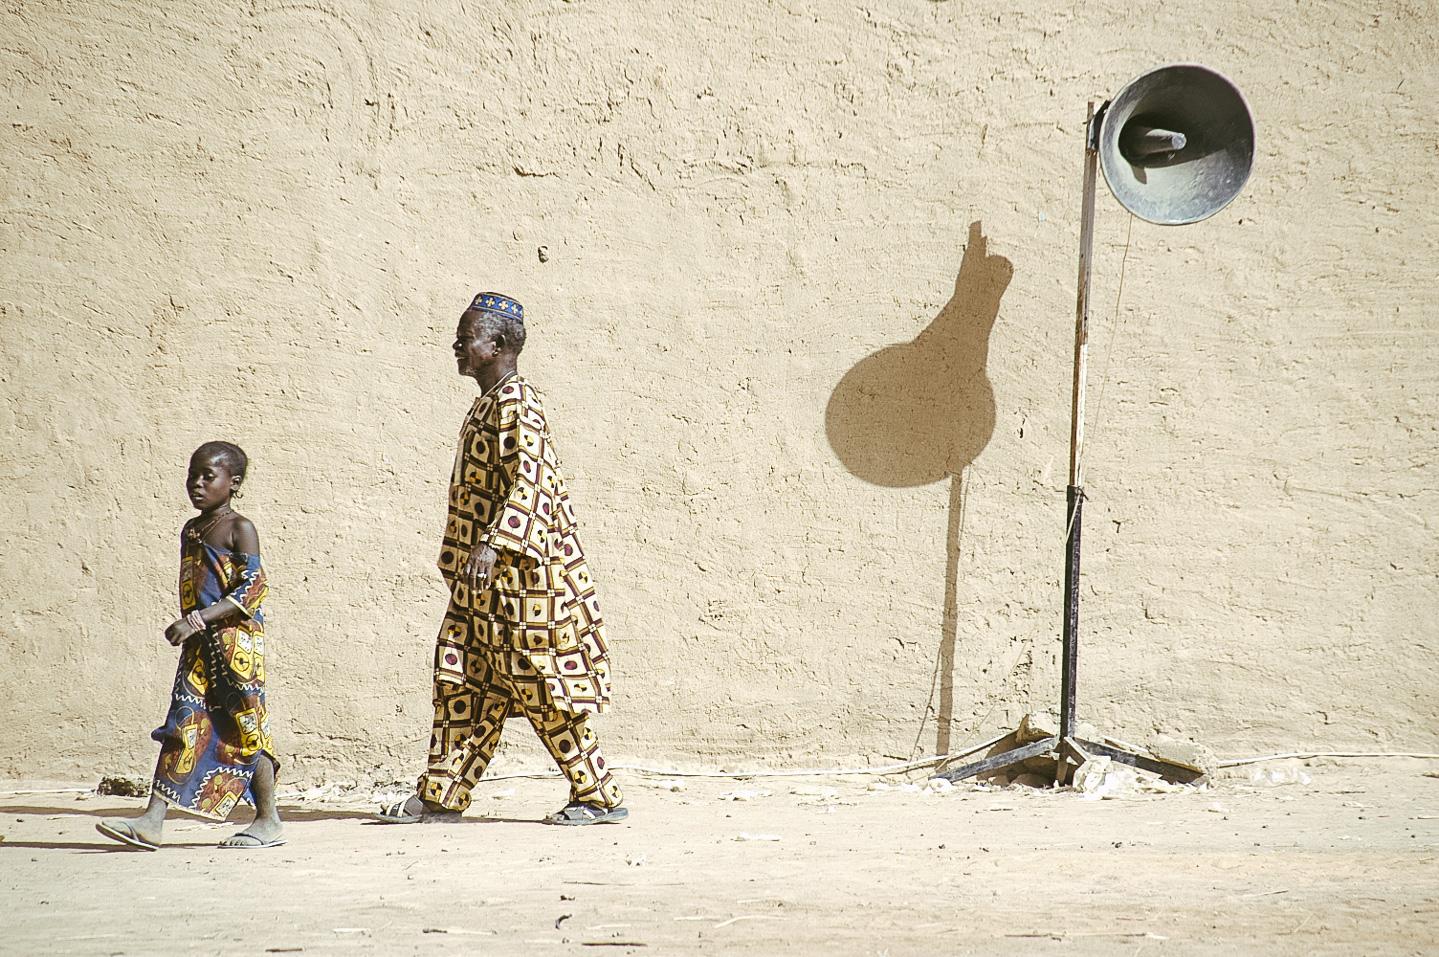 Rund um Afrika - Mali - Westafrika - Transafrika-426